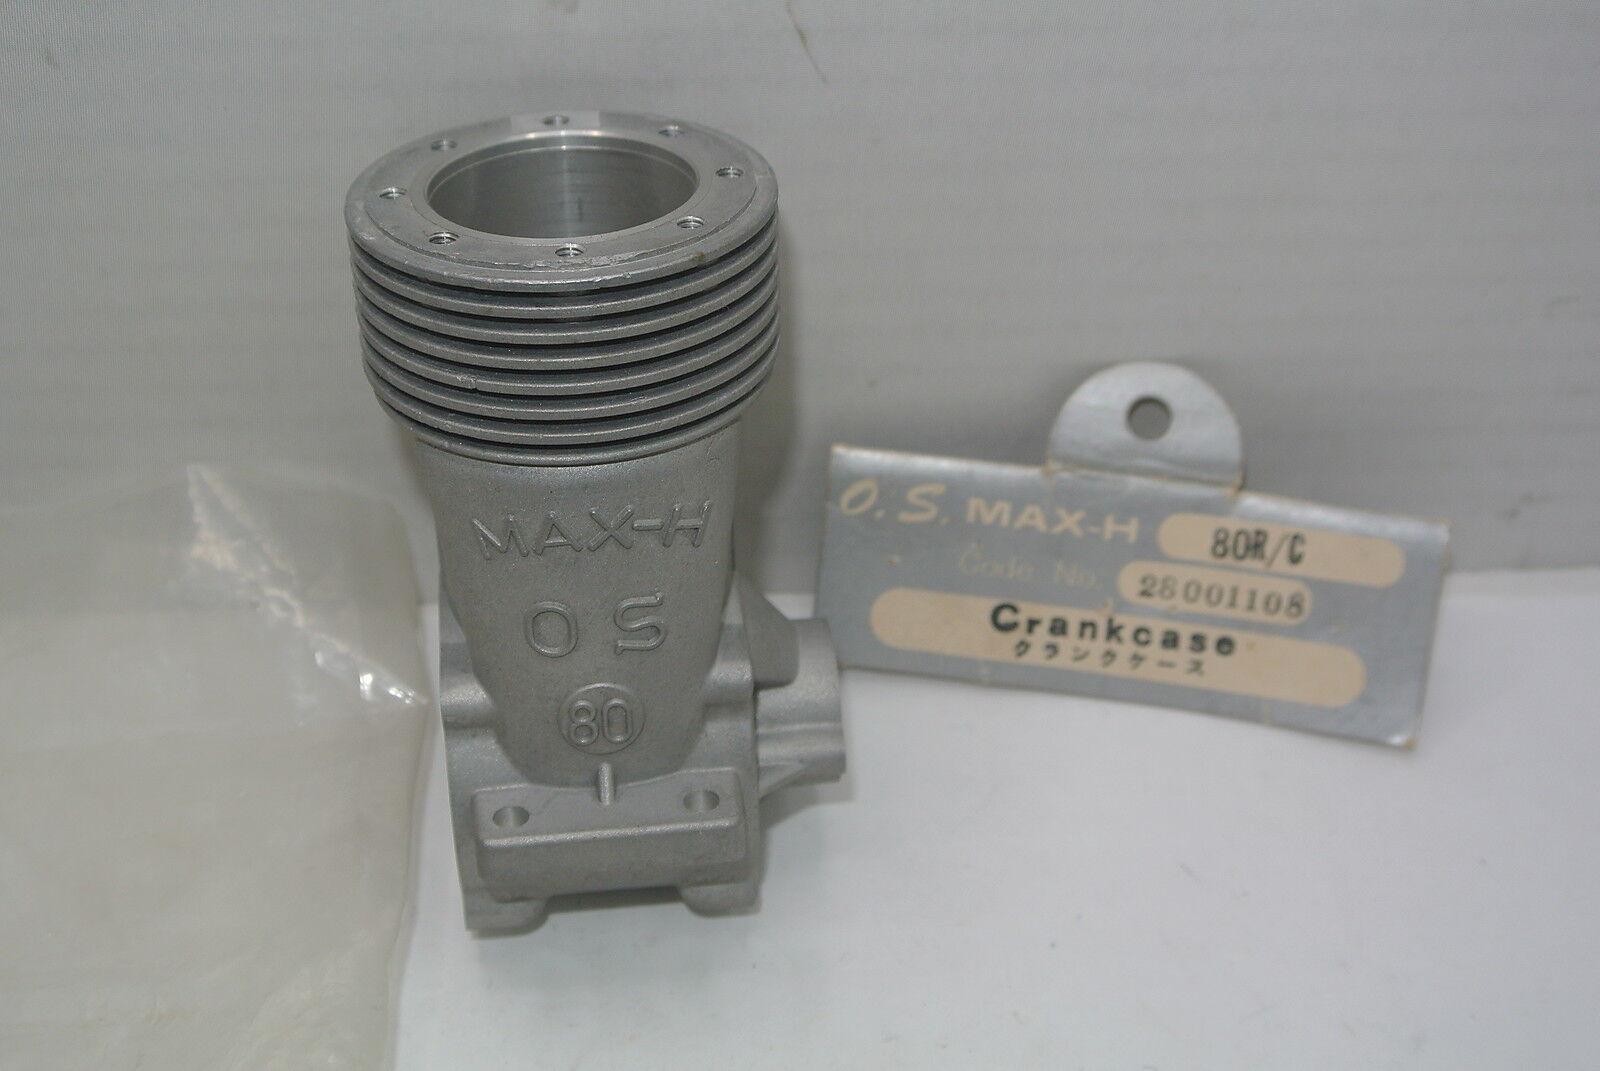 CRANKCASE FOR THE VINTAGE OS  MAX ENGINE .80 R C (Part   28001108) NIB  vendita con alto sconto